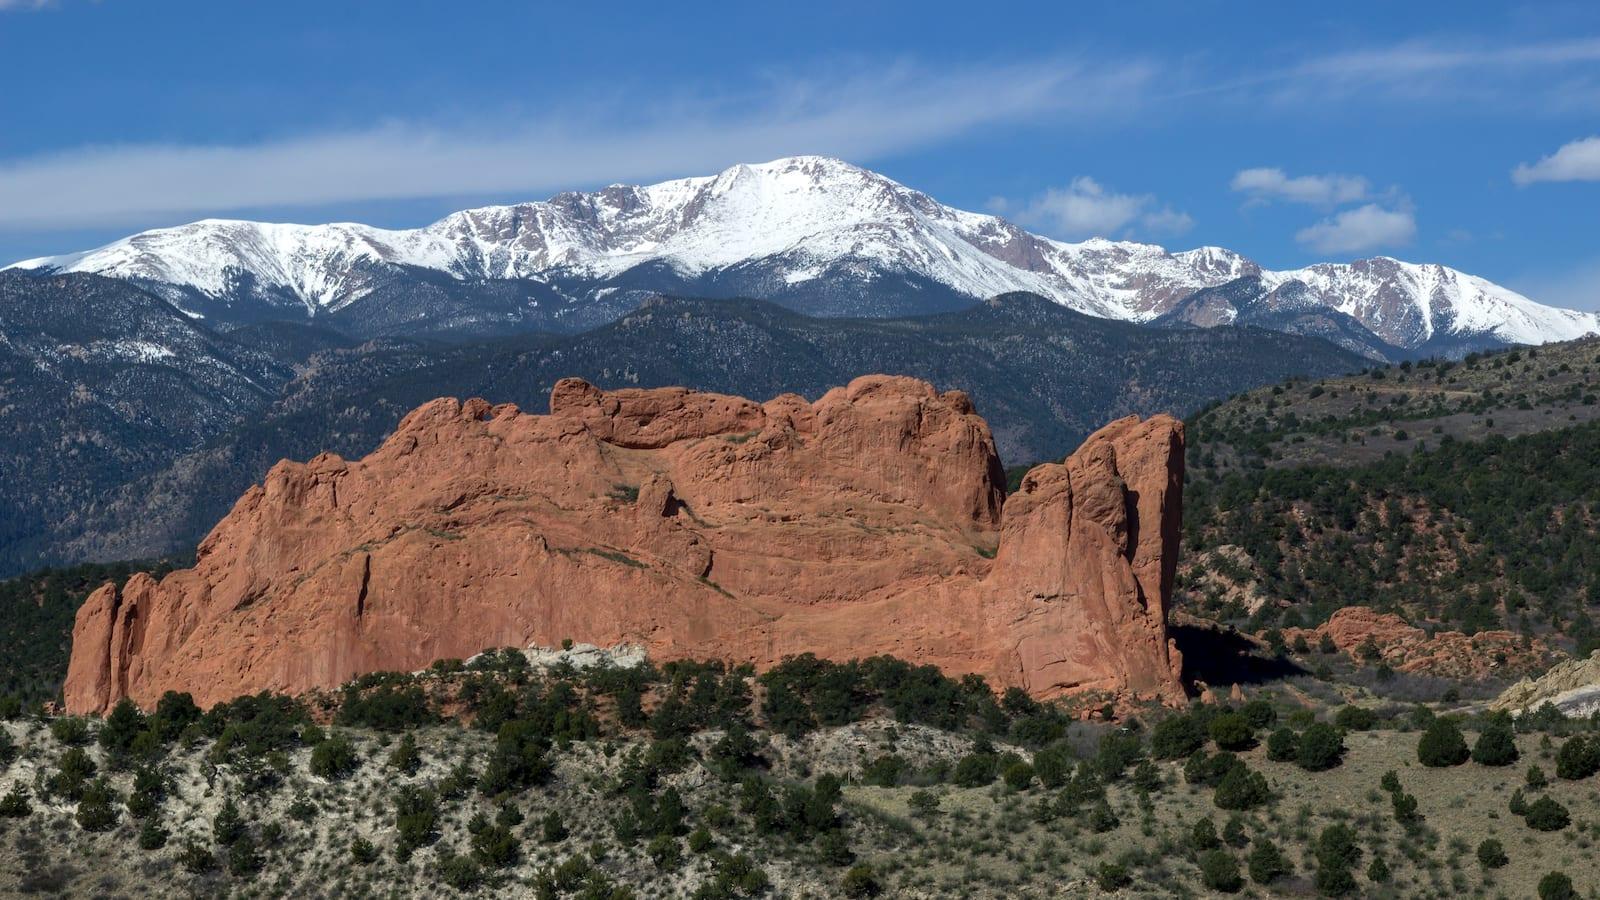 Pikes Peak Garden of the Gods Colorado Springs